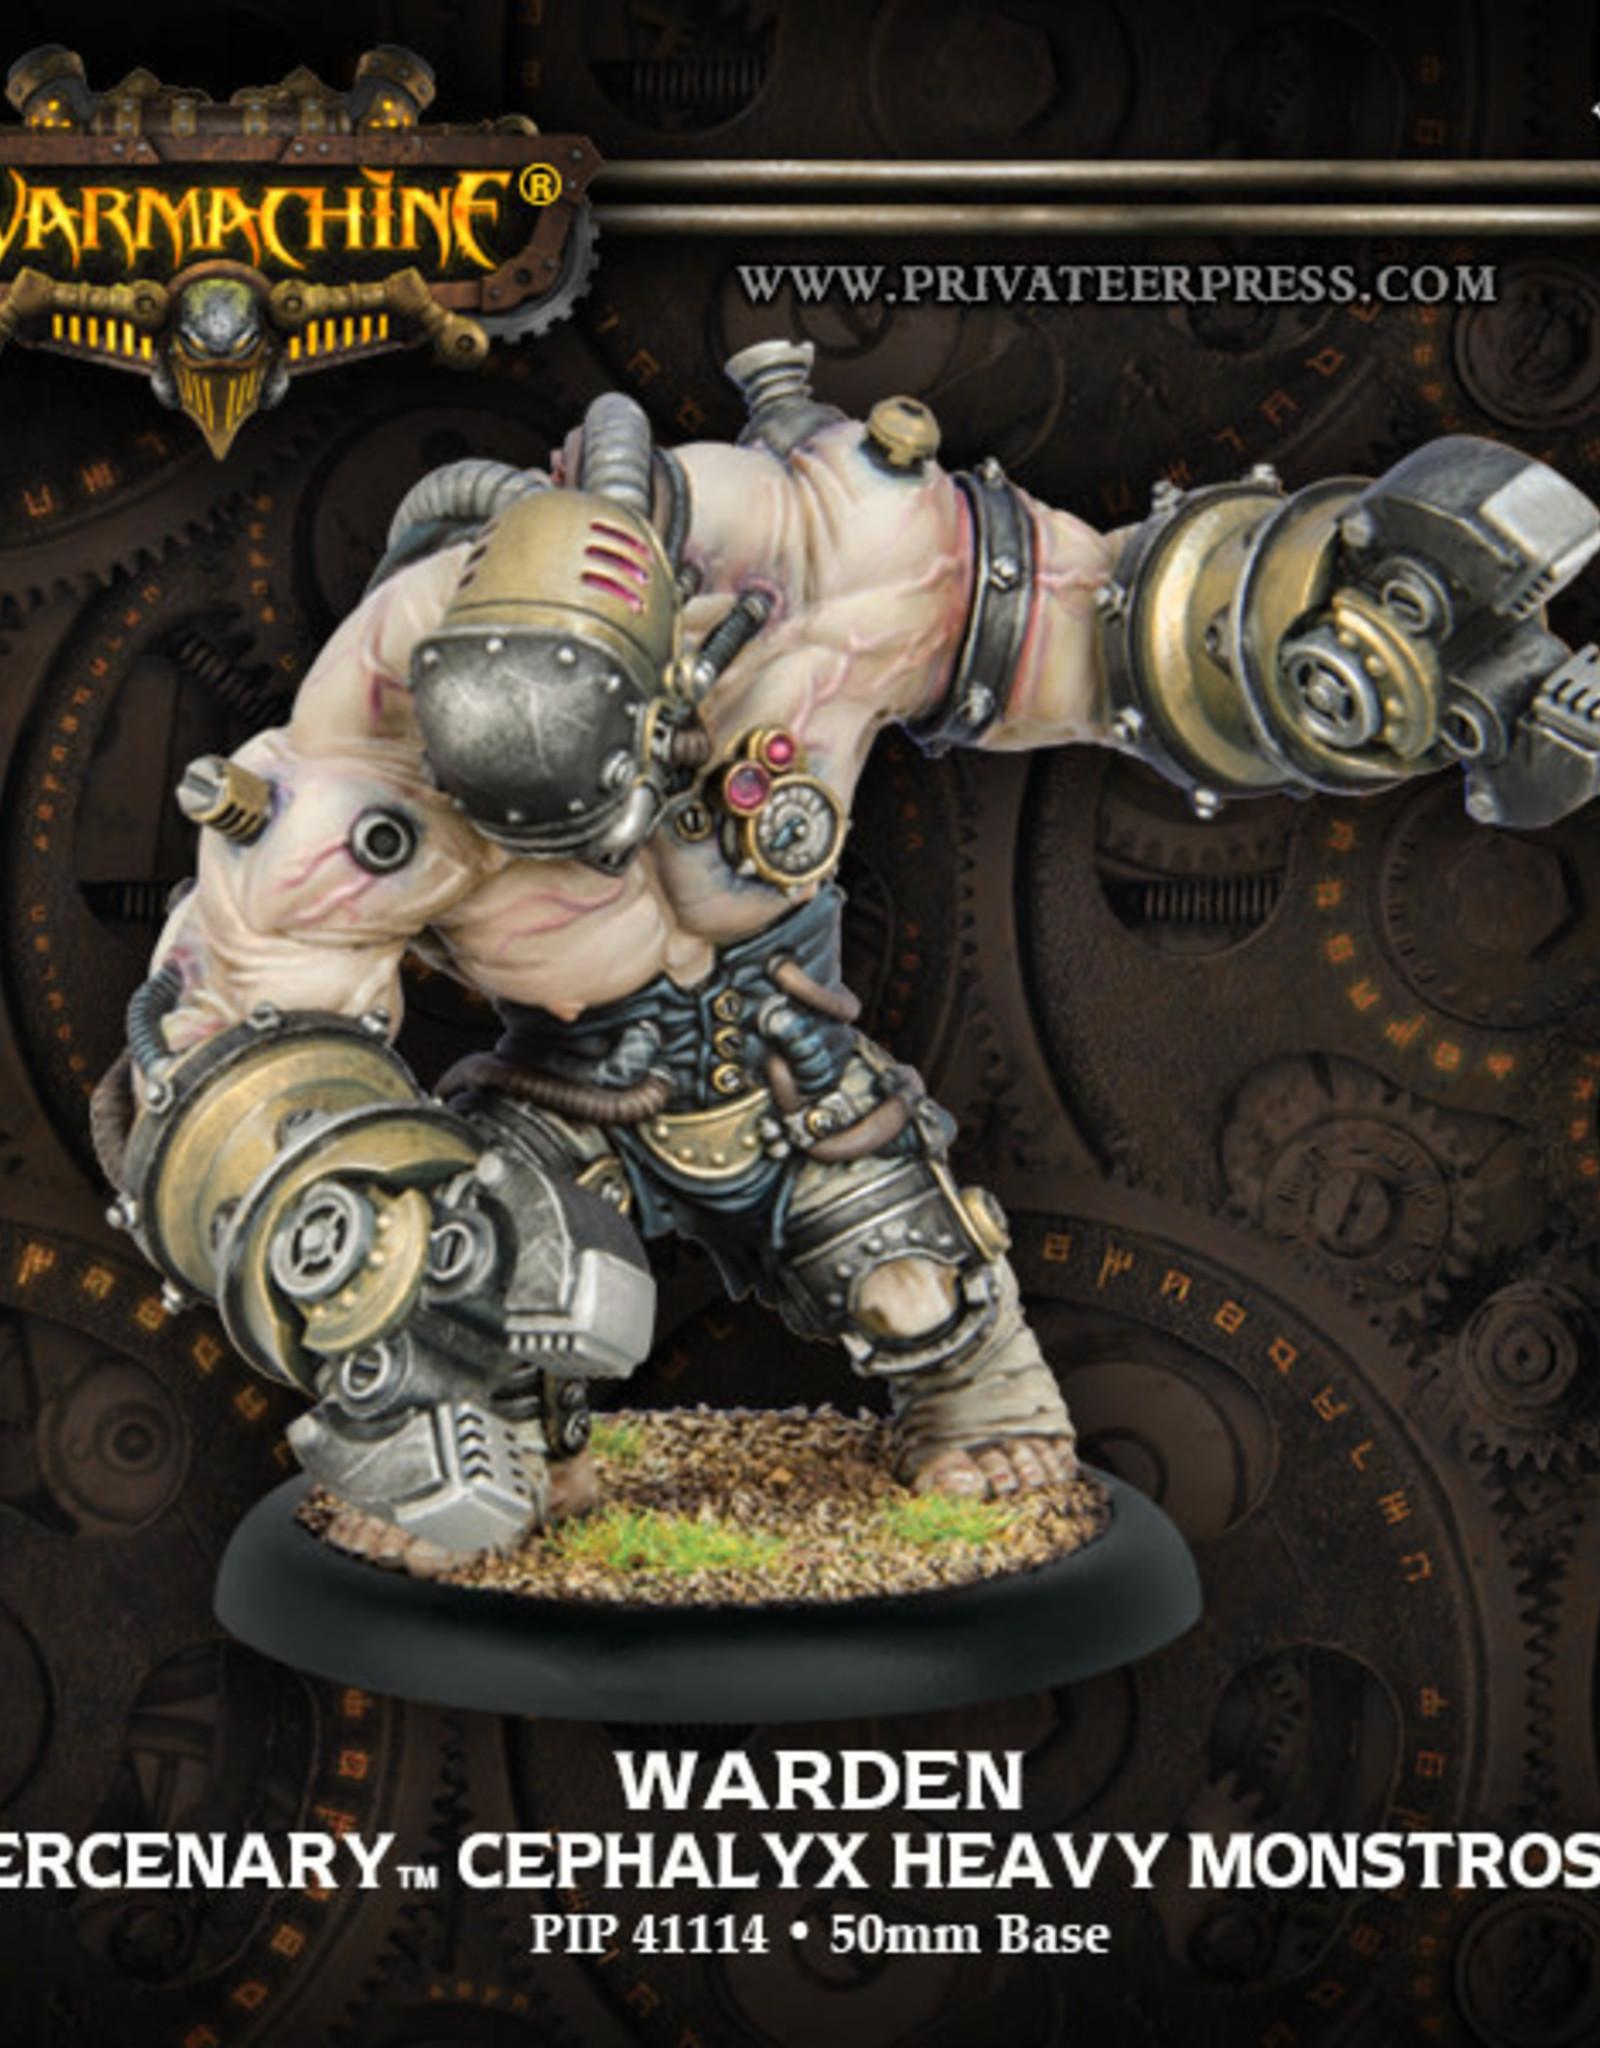 Warmachine Mercenaries - Cephalyx Subduer/Warden/Wrecker kit